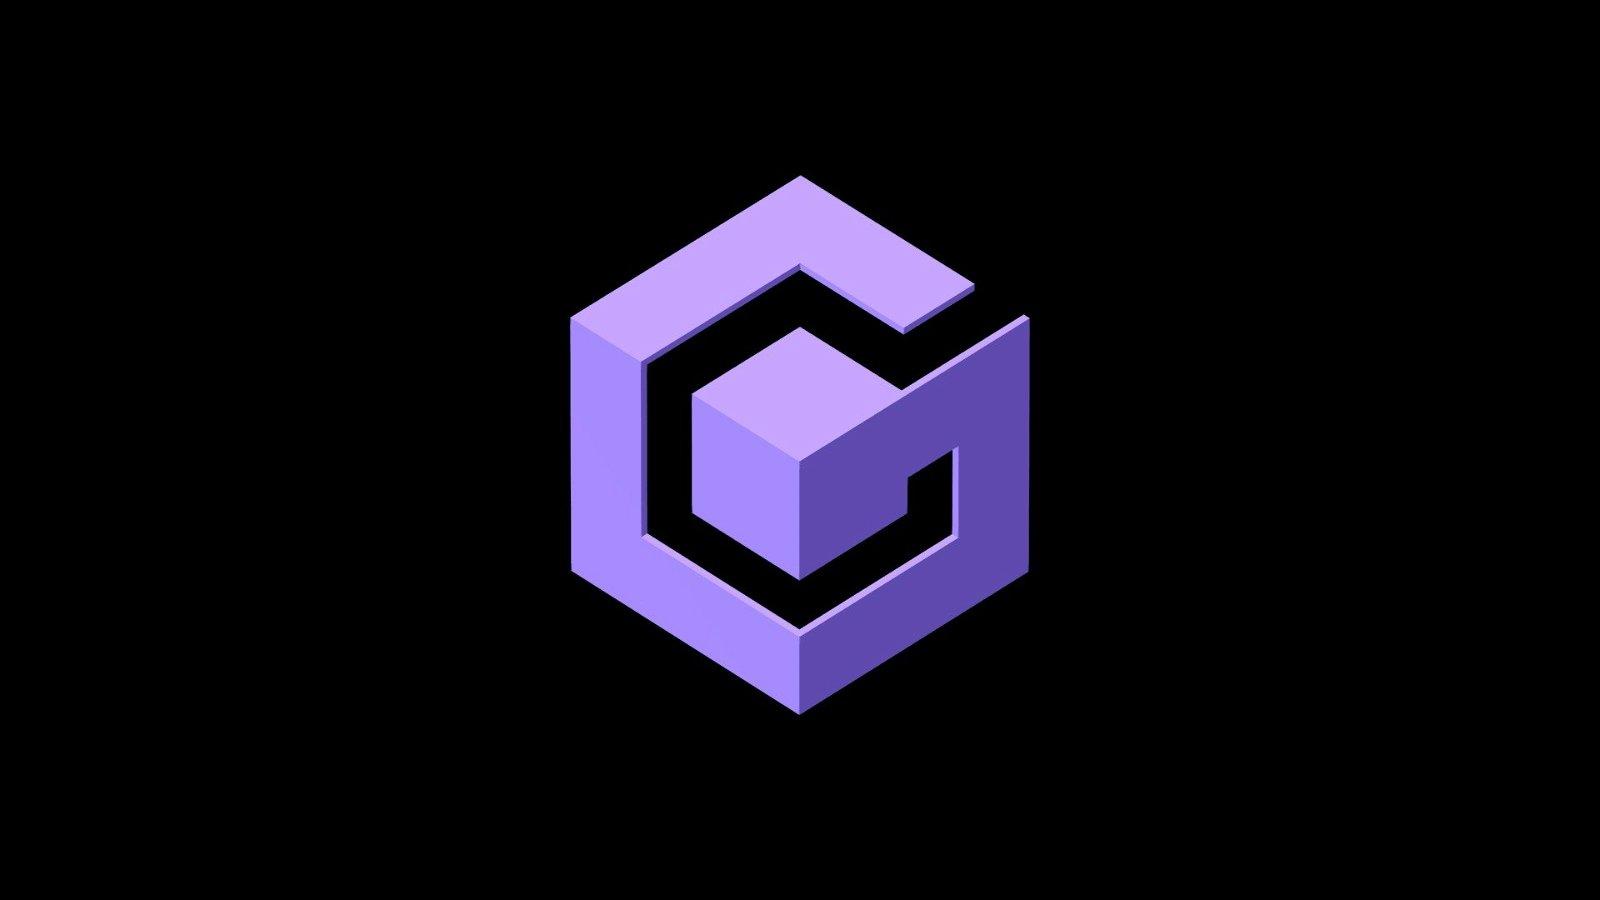 Editor's Choice: Top 5 GameCube Titles